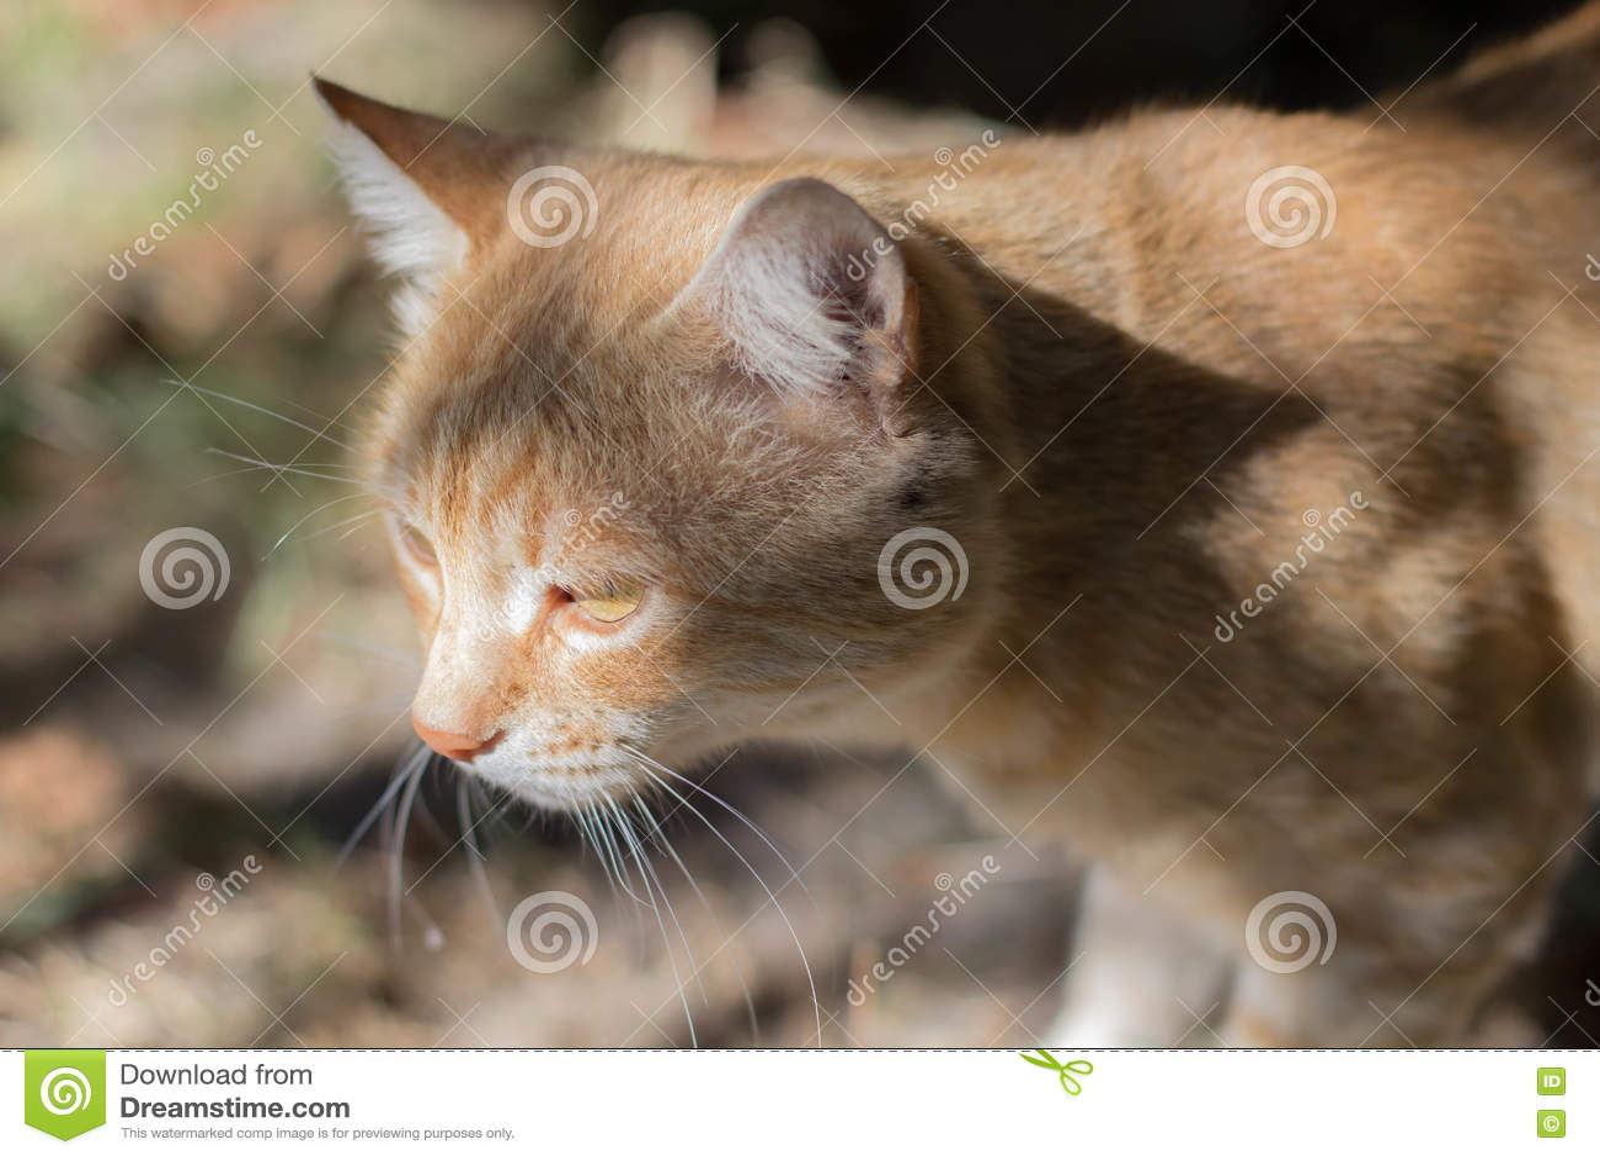 lonely sad cat - photo #7